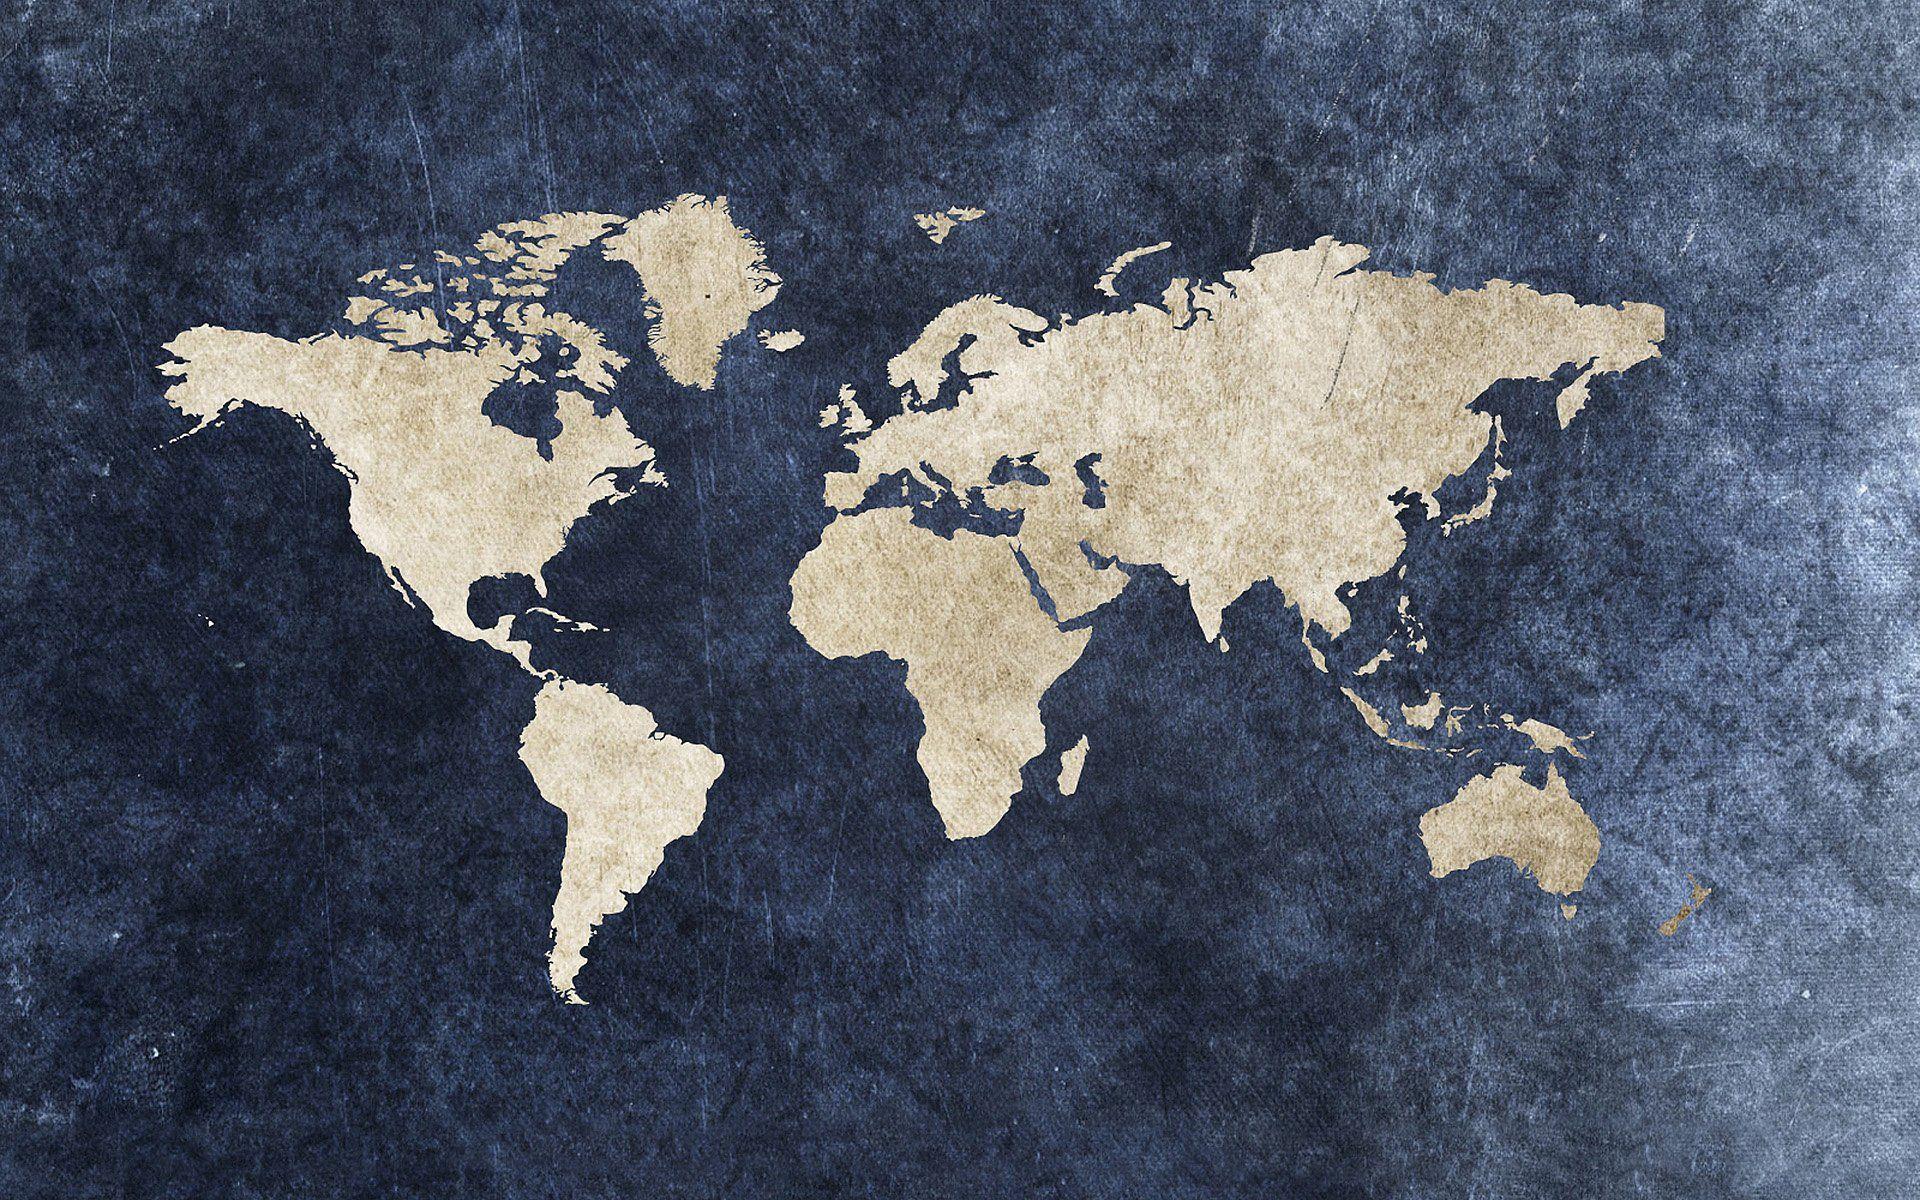 Grunge william morris flag wallpaper italian worldg 19201200 grungy world map hd wallpaper gumiabroncs Choice Image